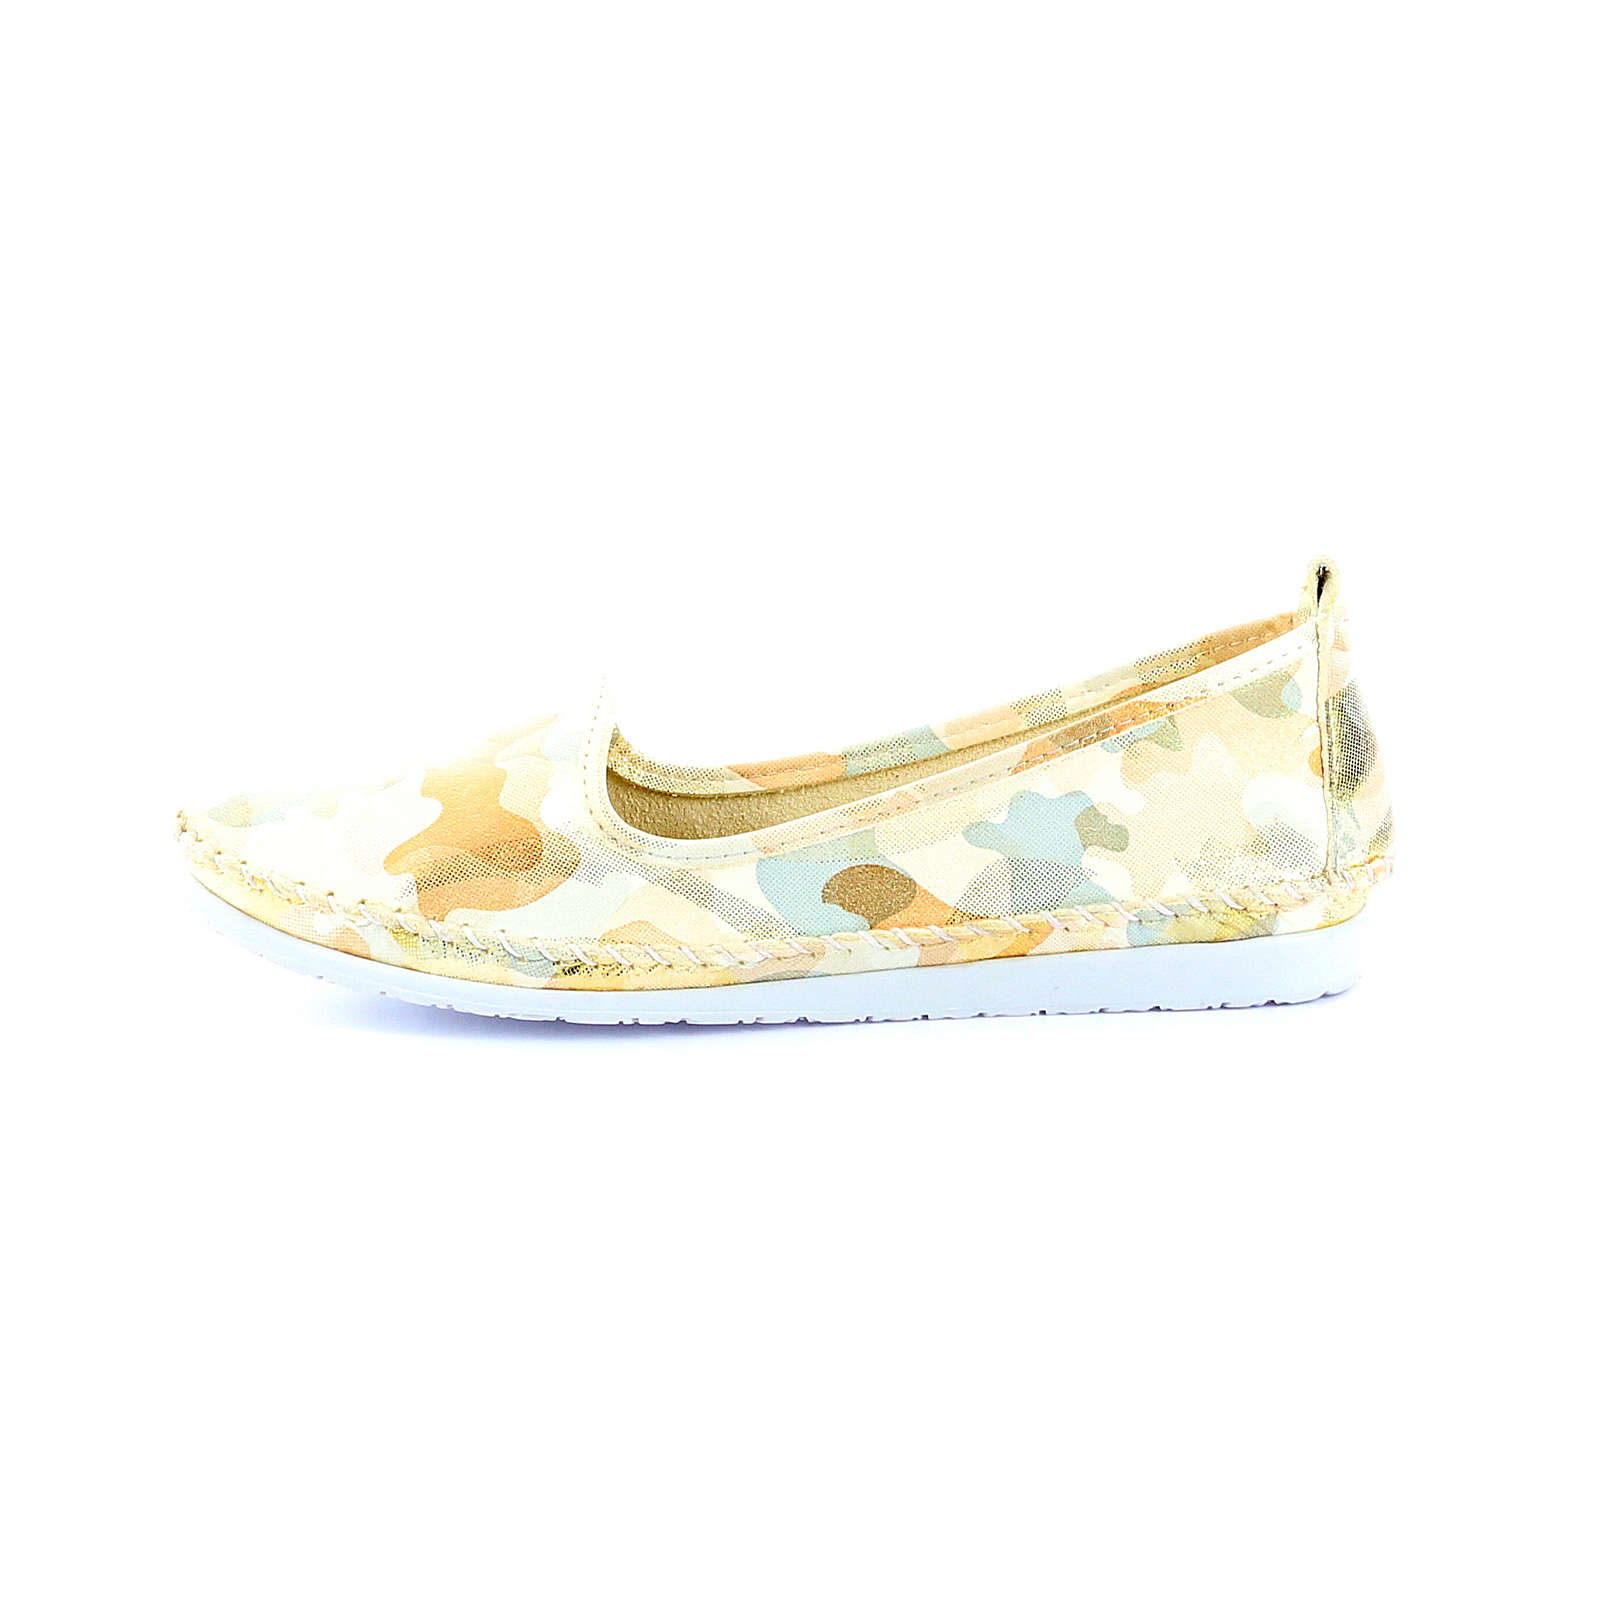 Andrea Conti Slipper 0025789 Klassische Slipper beige Damen Gr. 37